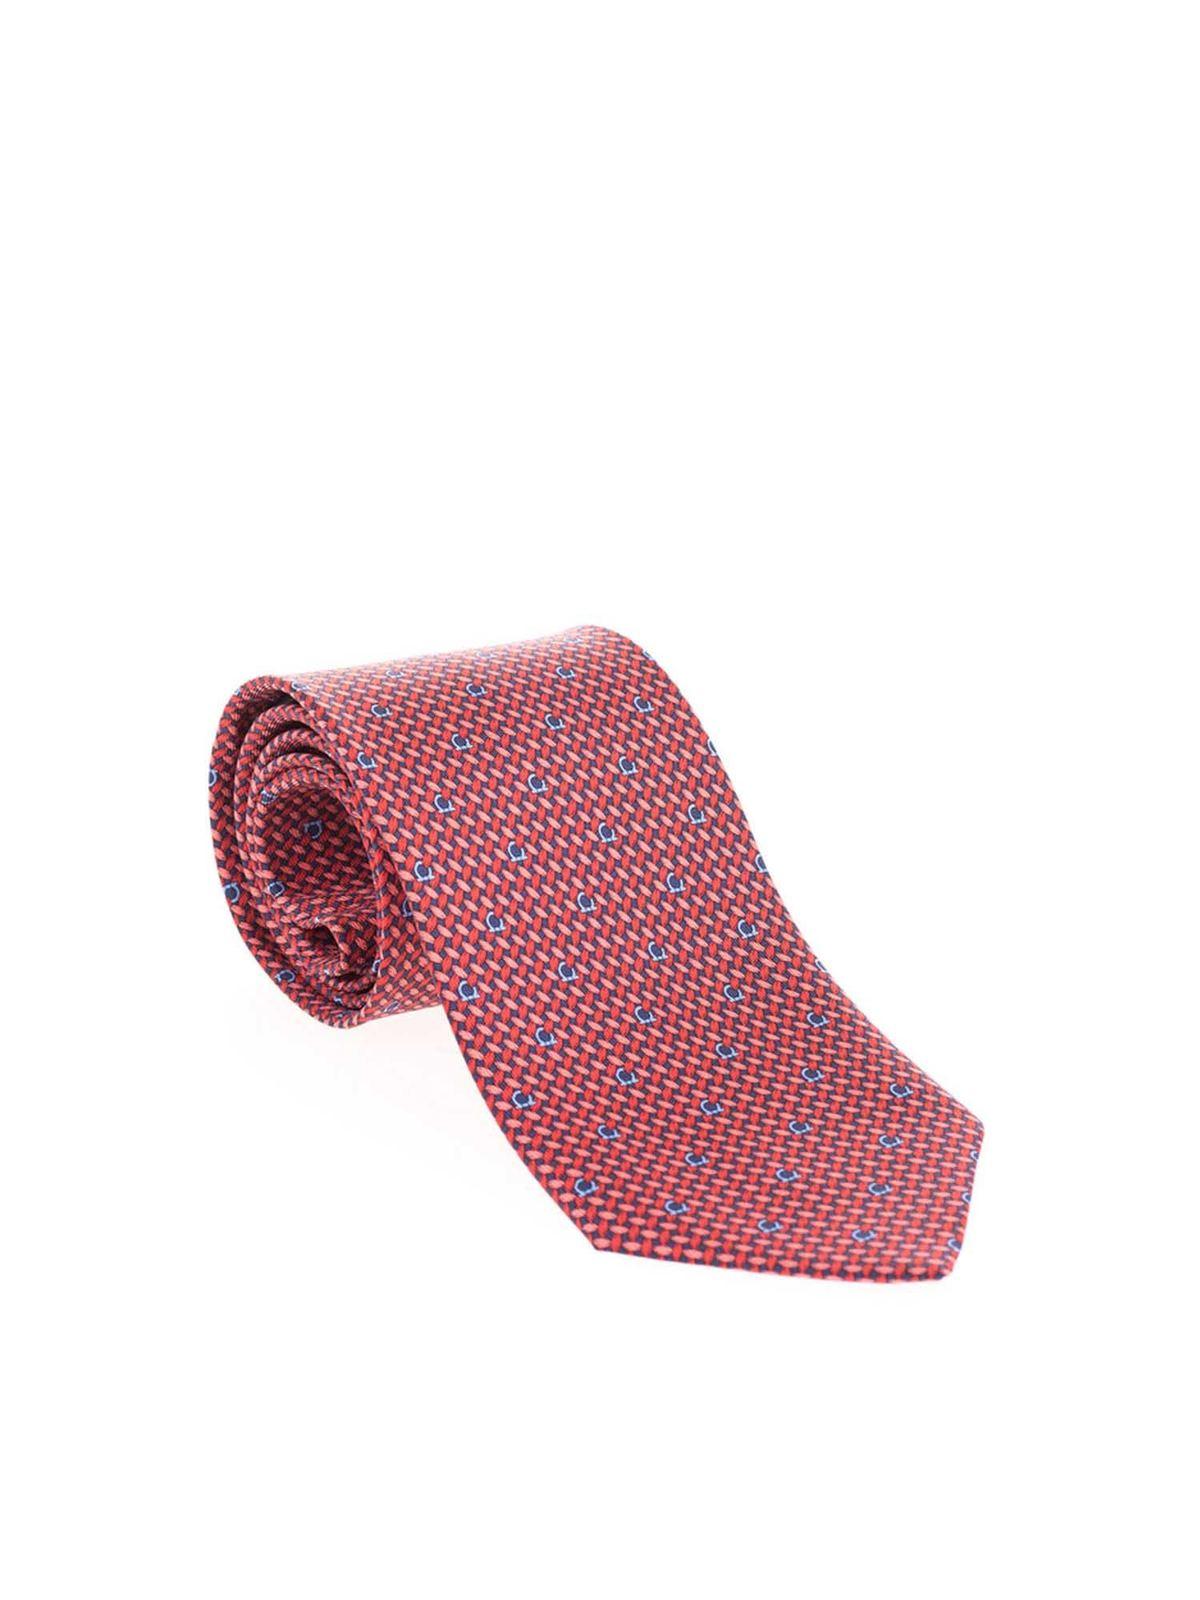 Incorrecto Bajar lava  Salvatore Ferragamo - Gancini tie in red and blue - کراوات، پاپیون - 731645